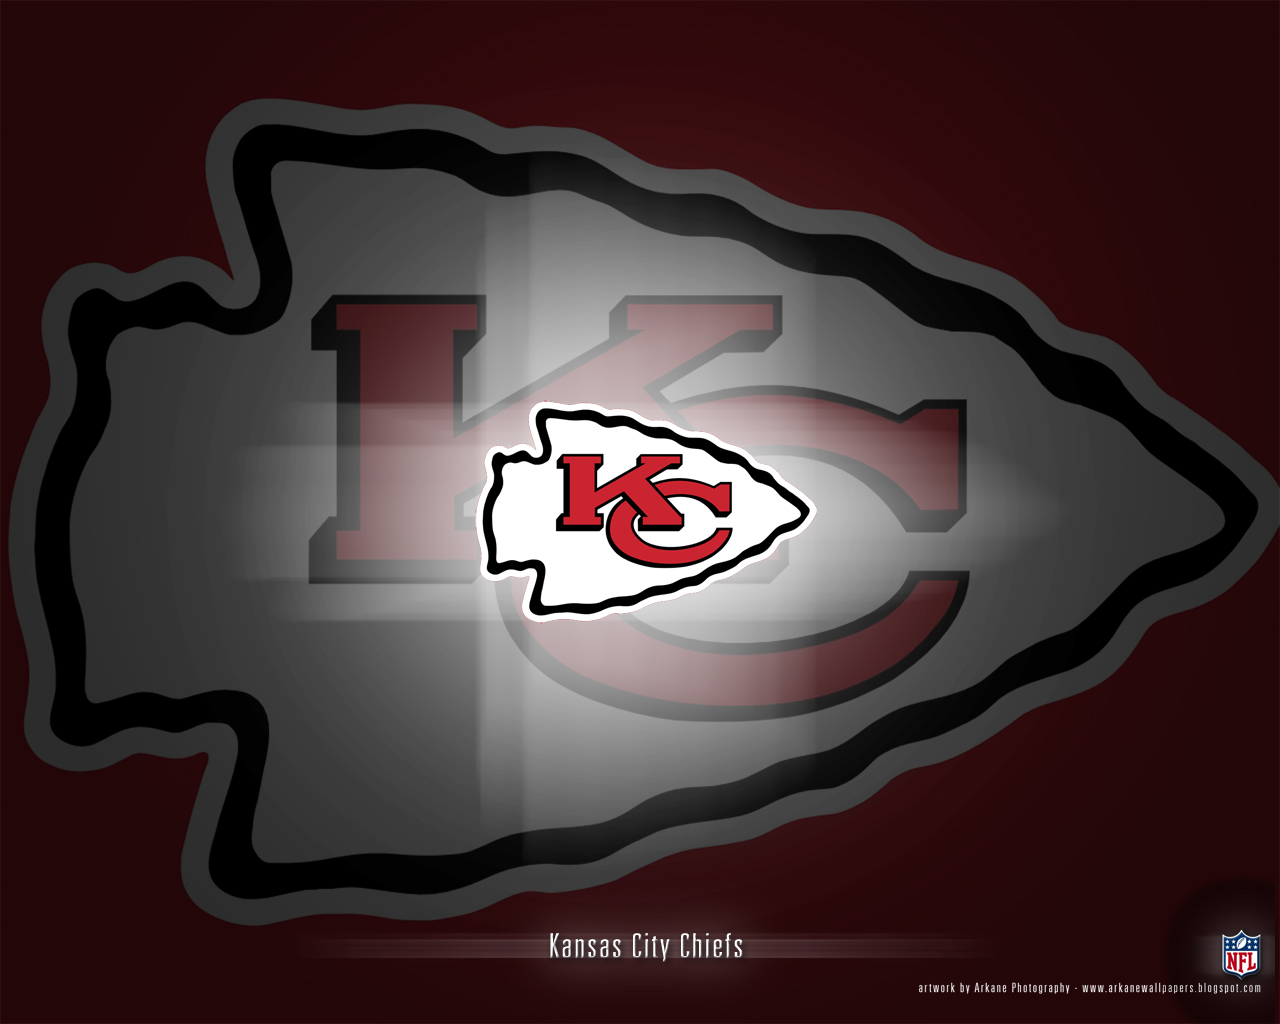 http://1.bp.blogspot.com/_JuYYGgmnUQU/SwRWSbU1q_I/AAAAAAAAAag/cxC29RMqm5I/s1600/Kansas+City+Chiefs.jpeg